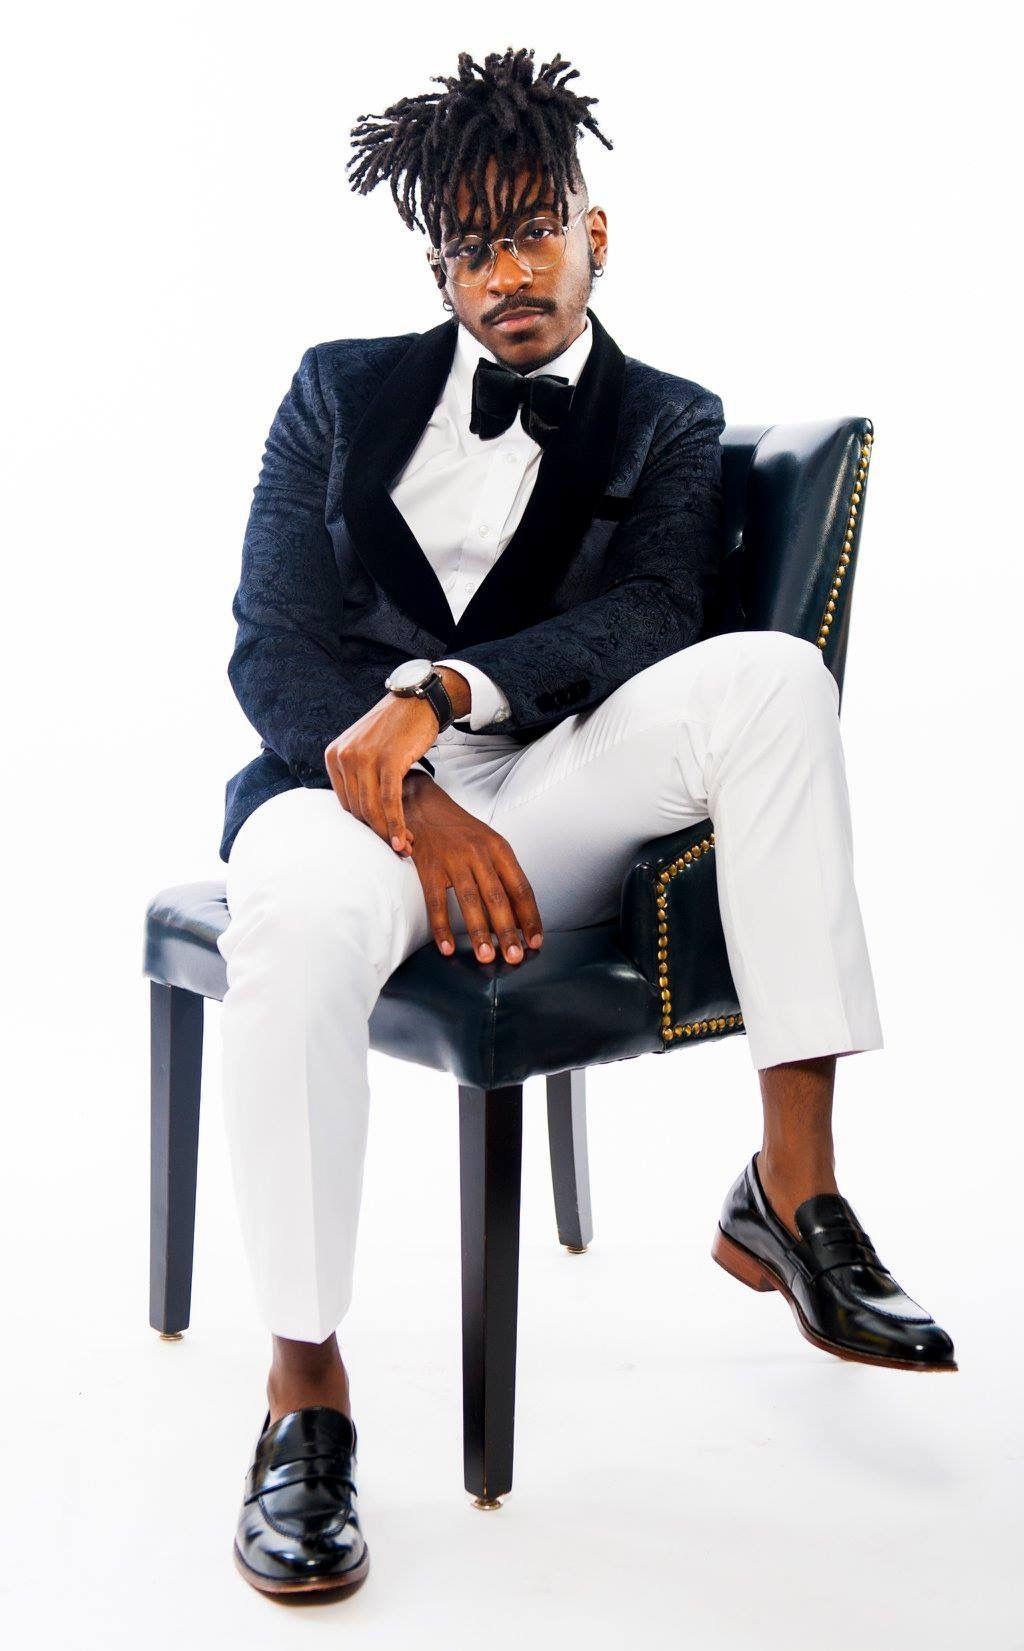 Haircuts for black men names ig thisguye  model name jamairo guye  black men hairstyles